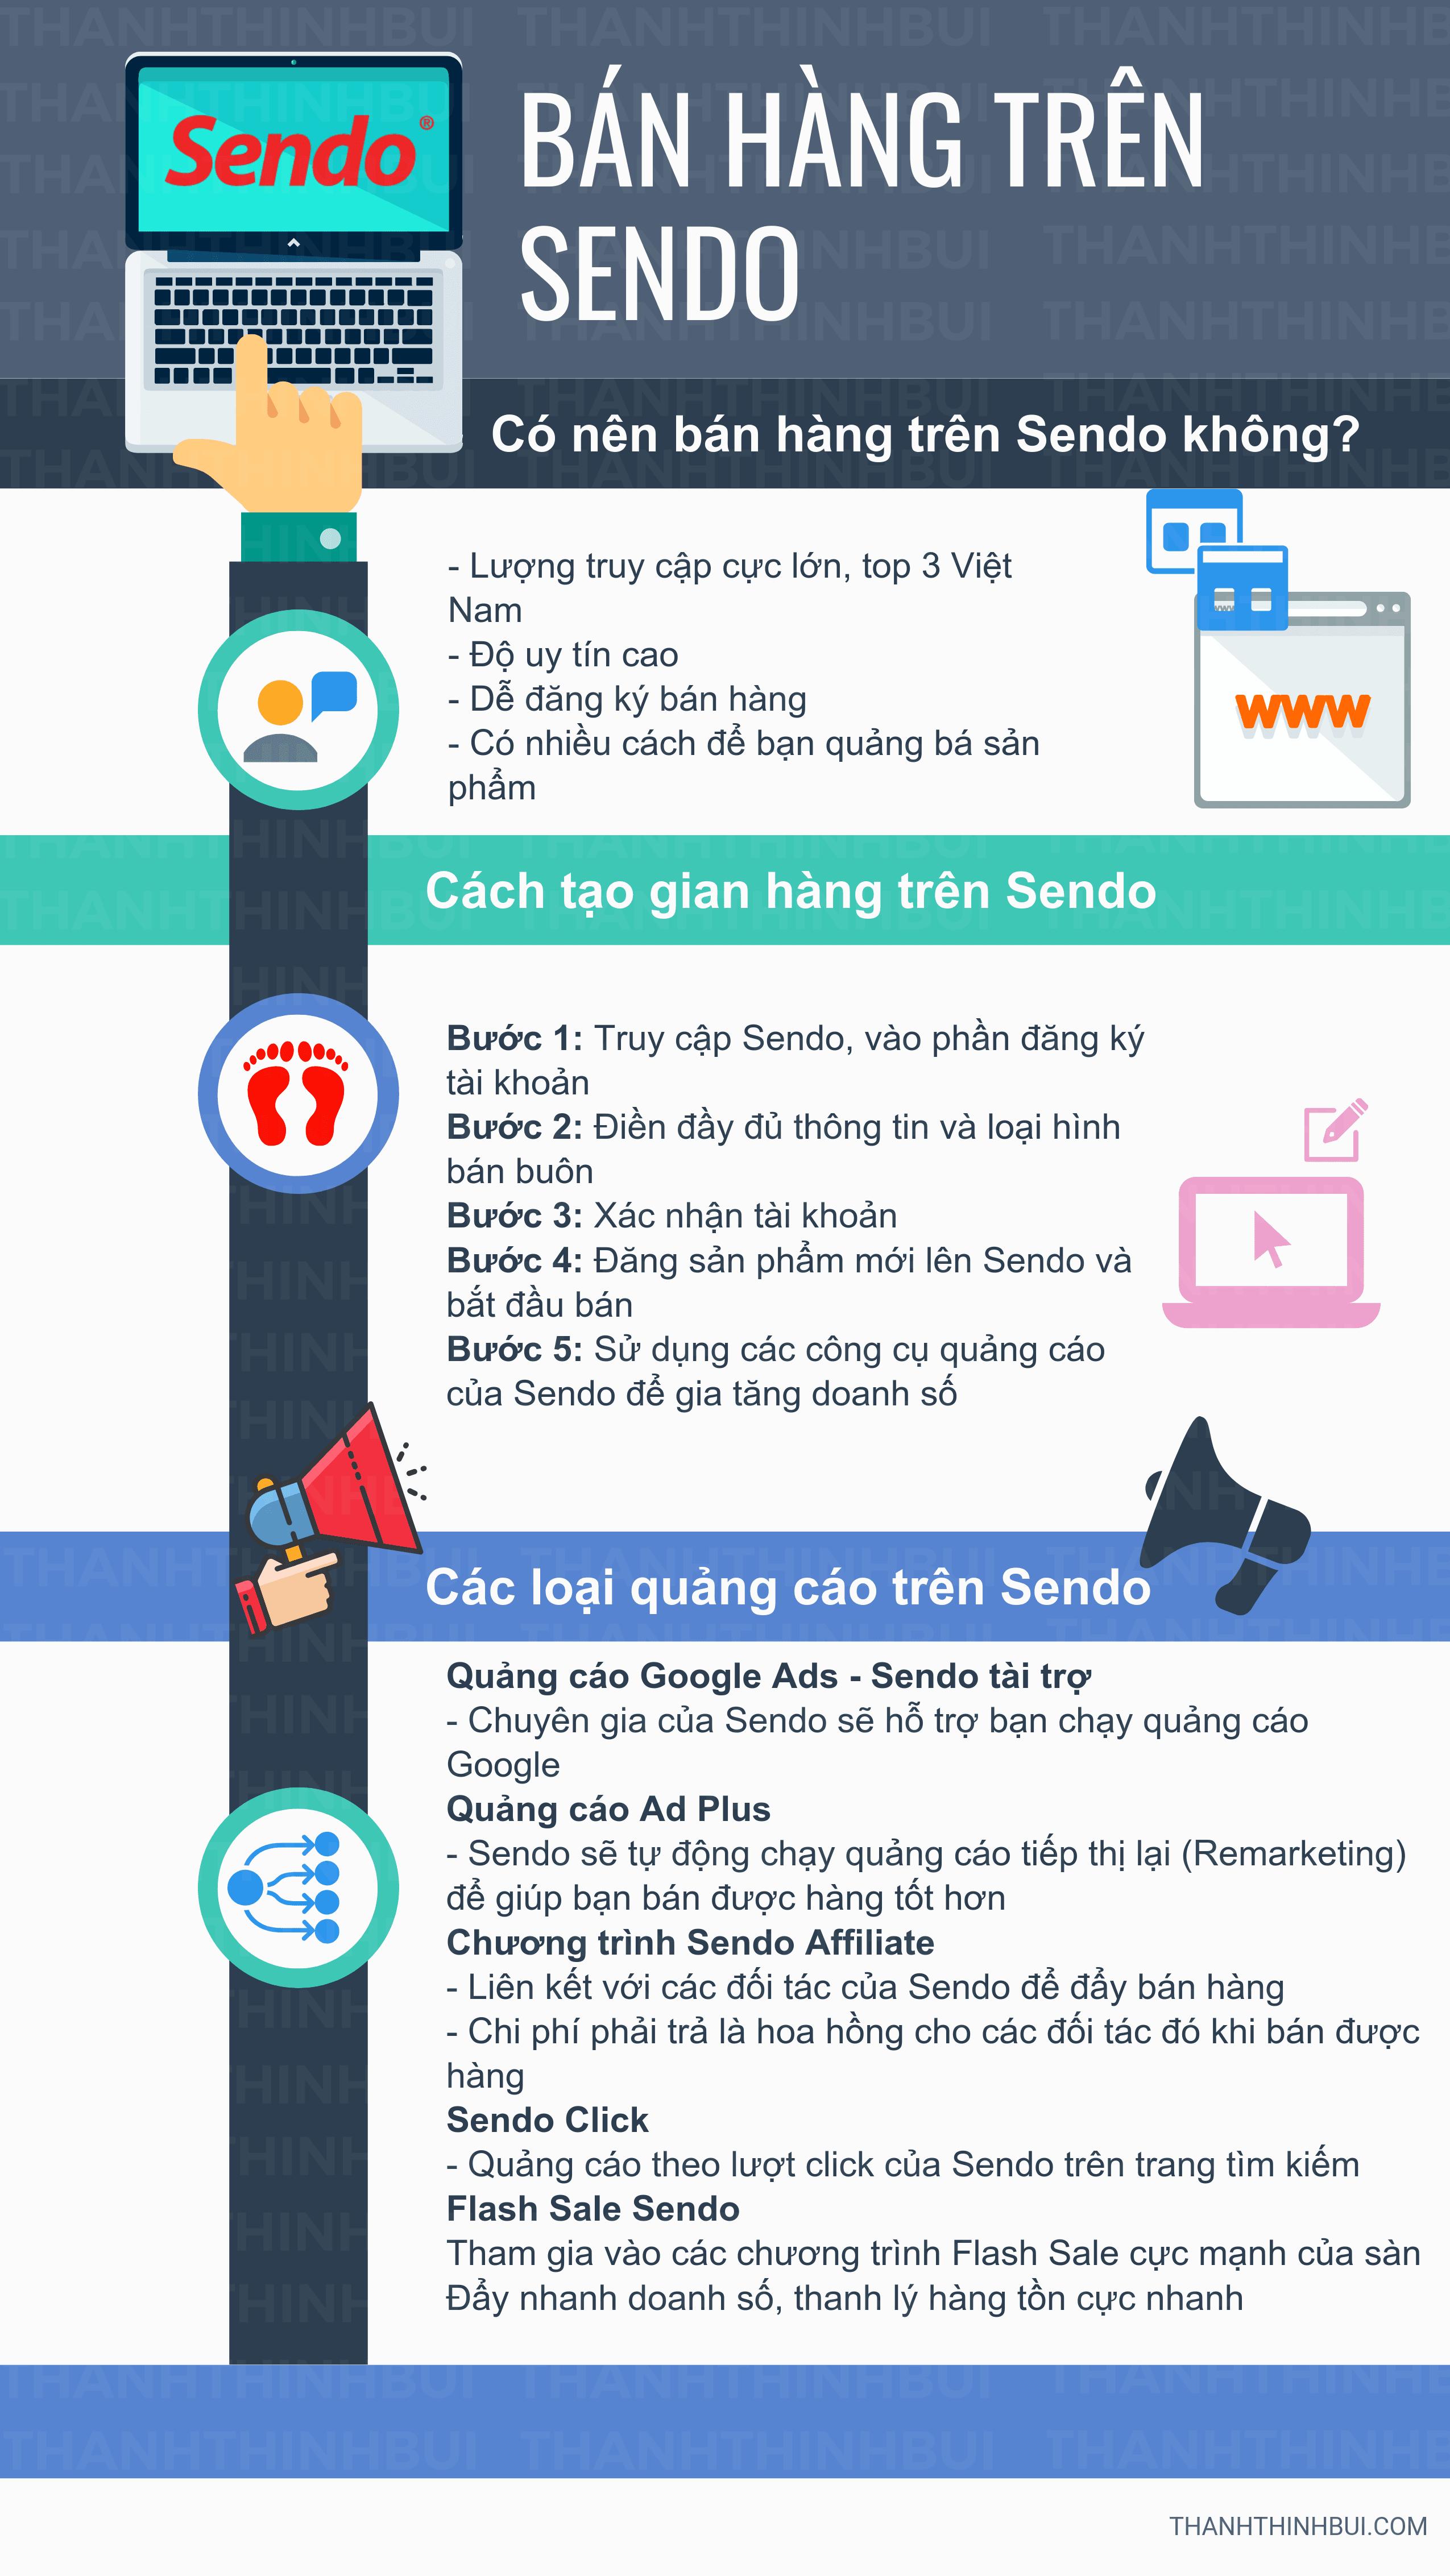 ban-hang-tren-sendo-infographic